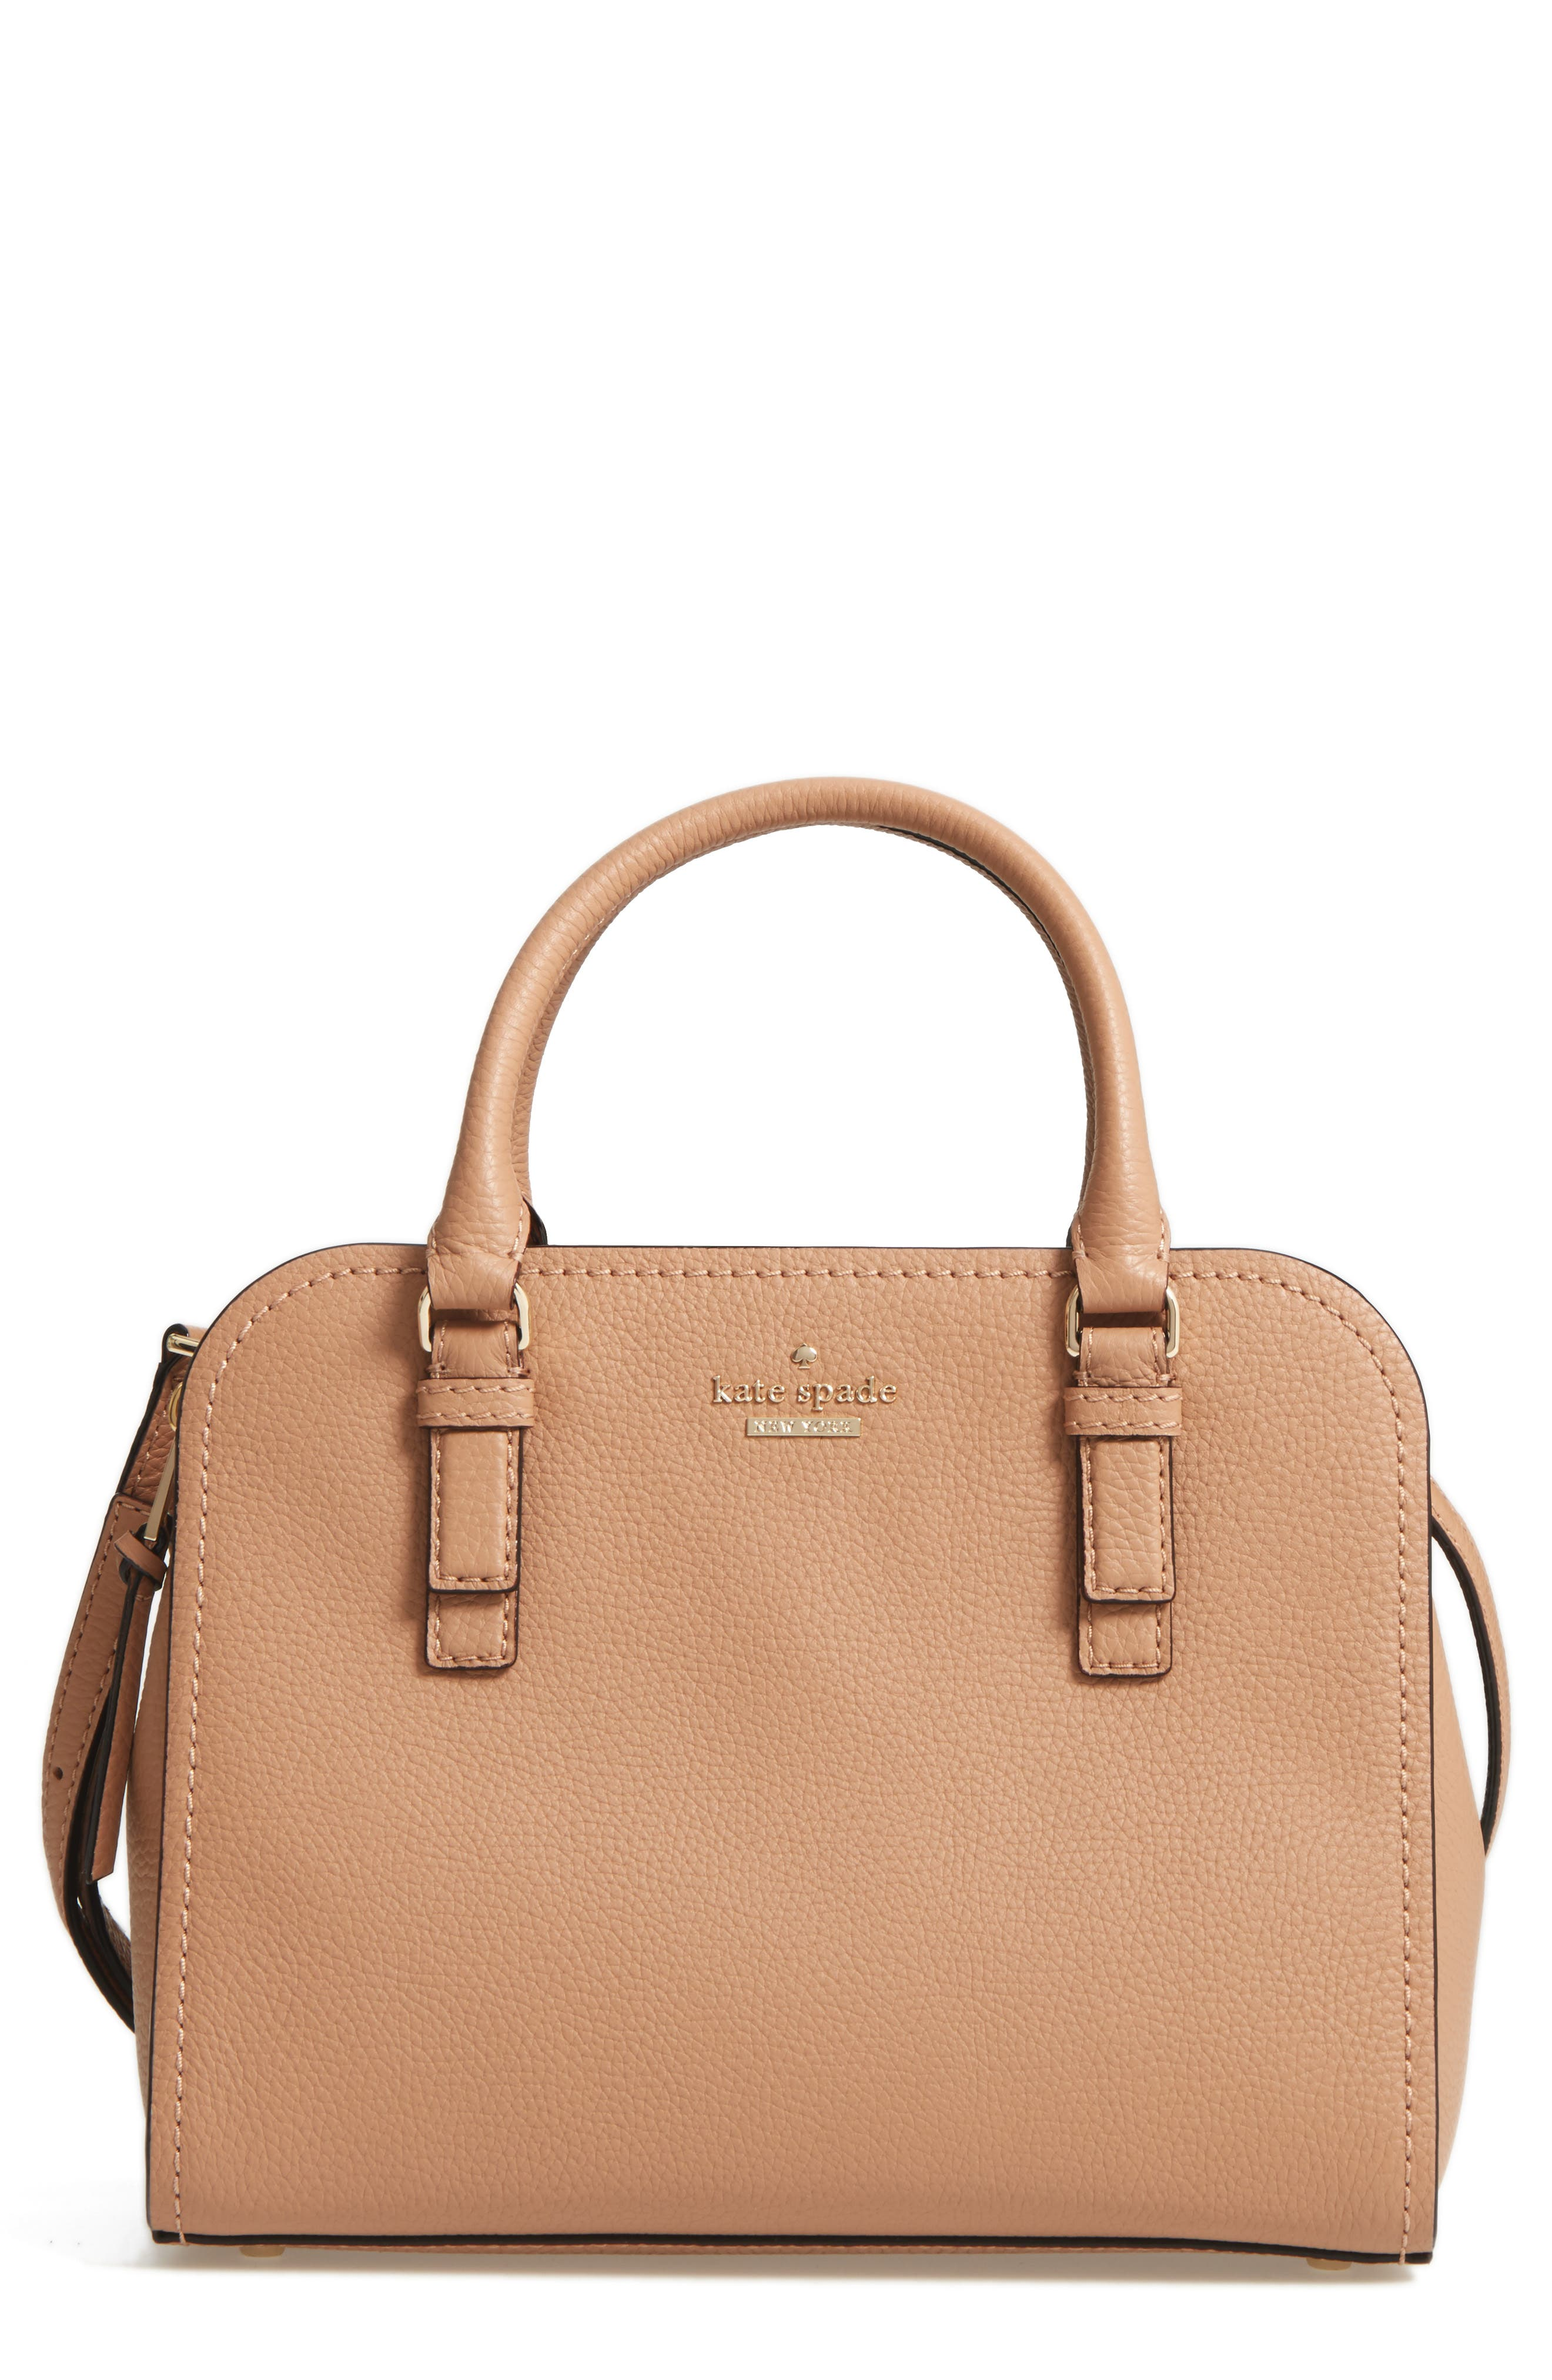 jackson street small kiernan leather top handle satchel,                             Main thumbnail 1, color,                             Hazel